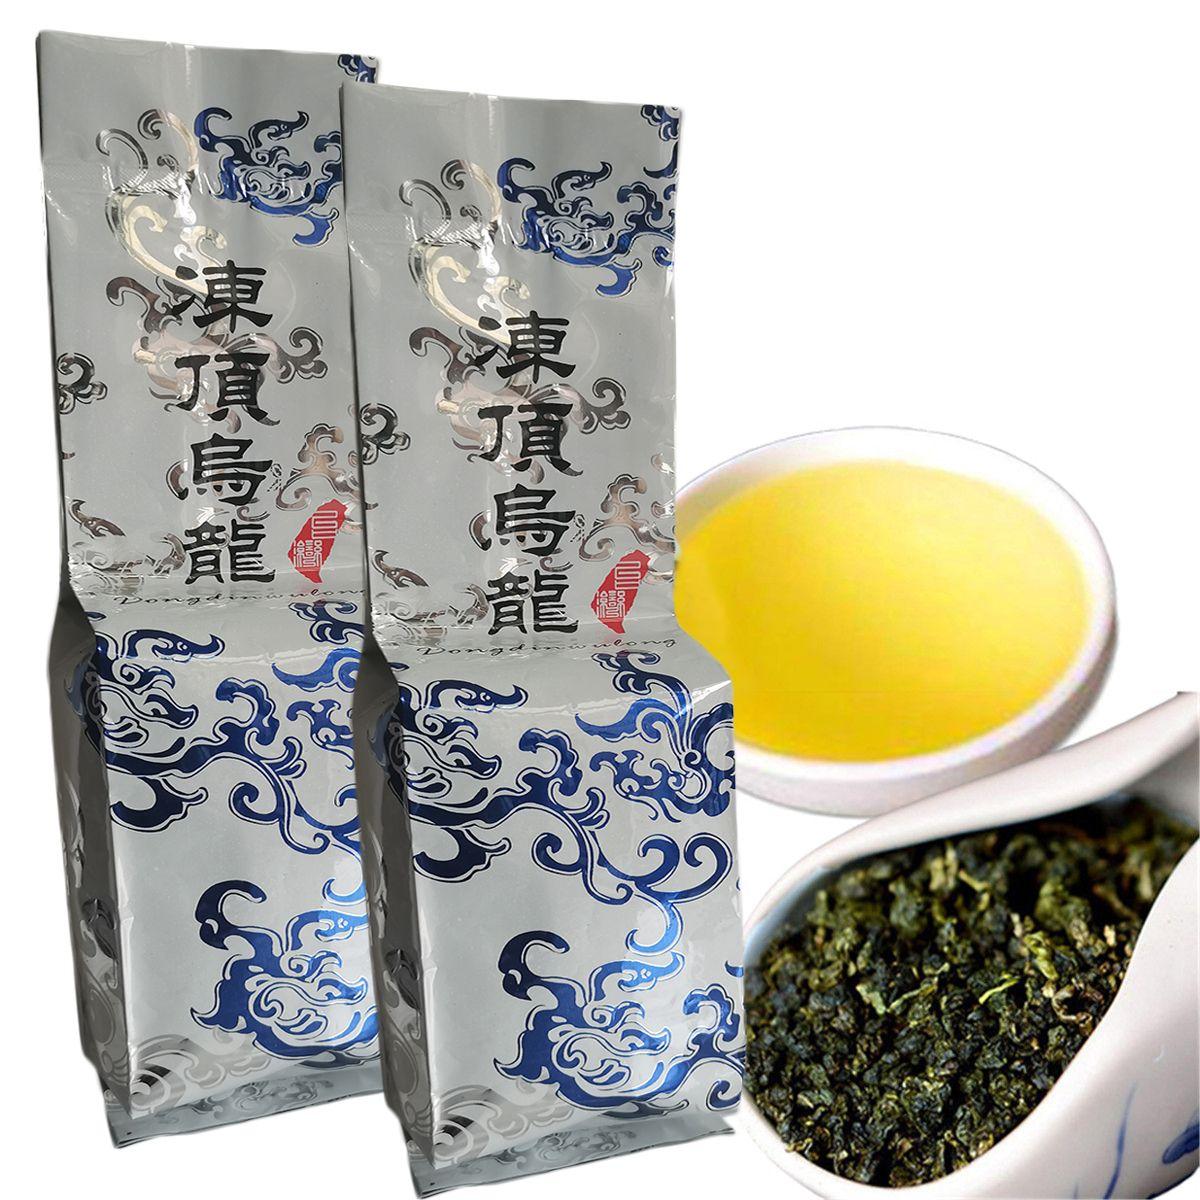 Yeşil Gıda 250g Çin Tayvan Premium Tieguanyin Oolong Güzellik Çay Yüksek Dağlar Özel Süt Tikuanyin Oolong Çay Kravat Guan Yin Yeşil Çay